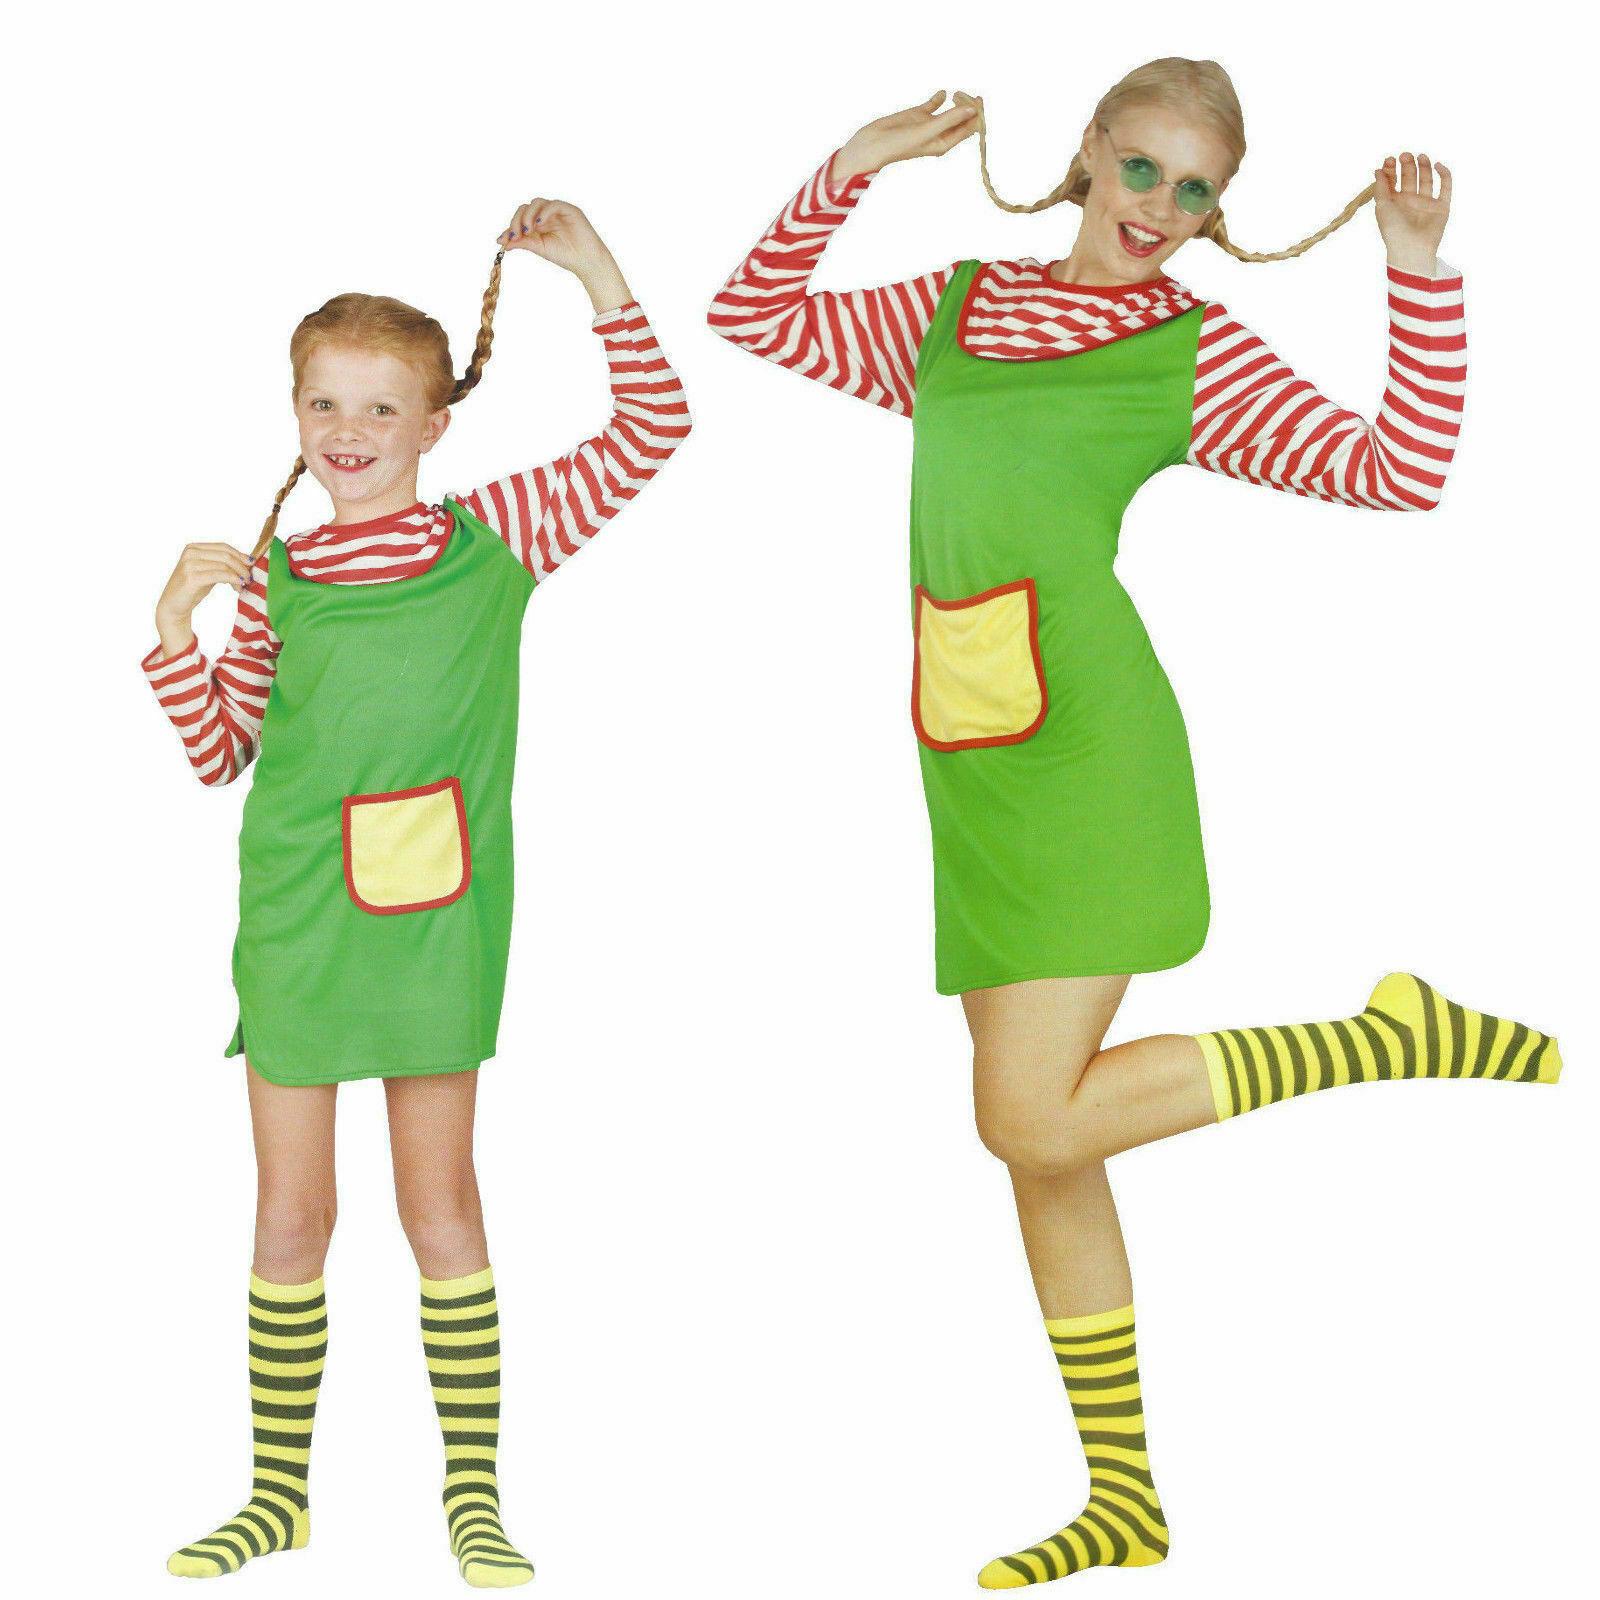 Freche Göre Karneval Kostüm Fasching Verkleidung Kleid Strümpfe Mädchen Damen